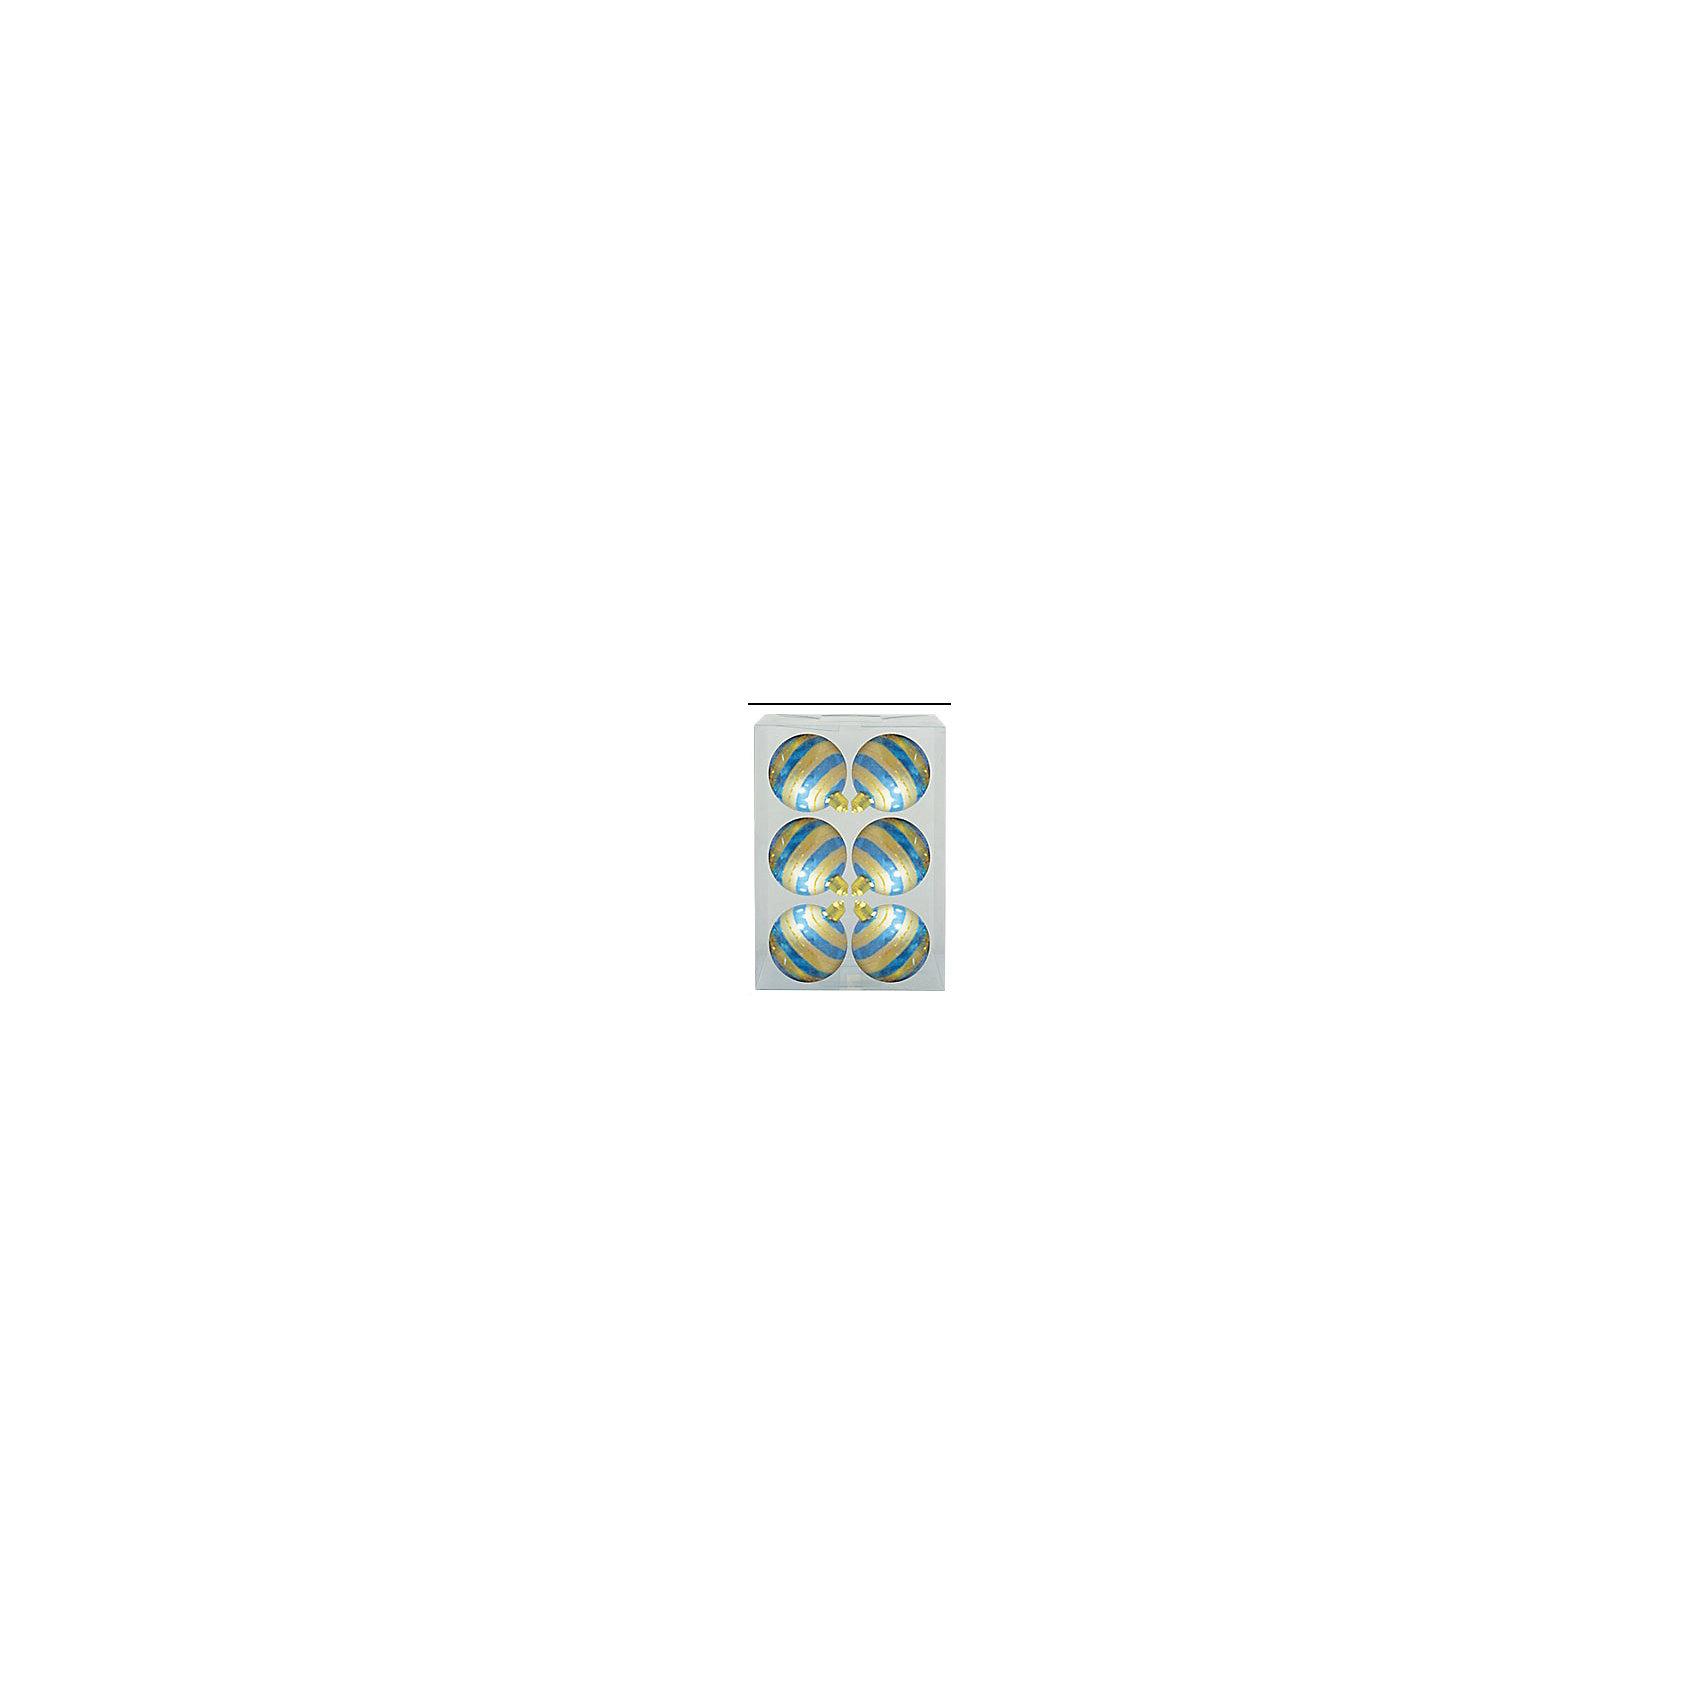 Набор шаров Детский 6 шт, 6 см, бирюза глянцевый с узоромнабор шаров ДЕТСКИЙ 6 шт, 6 см, бирюза глянц с узором  золот полоса<br><br>Ширина мм: 200<br>Глубина мм: 200<br>Высота мм: 10<br>Вес г: 100<br>Возраст от месяцев: 36<br>Возраст до месяцев: 2147483647<br>Пол: Унисекс<br>Возраст: Детский<br>SKU: 5101044